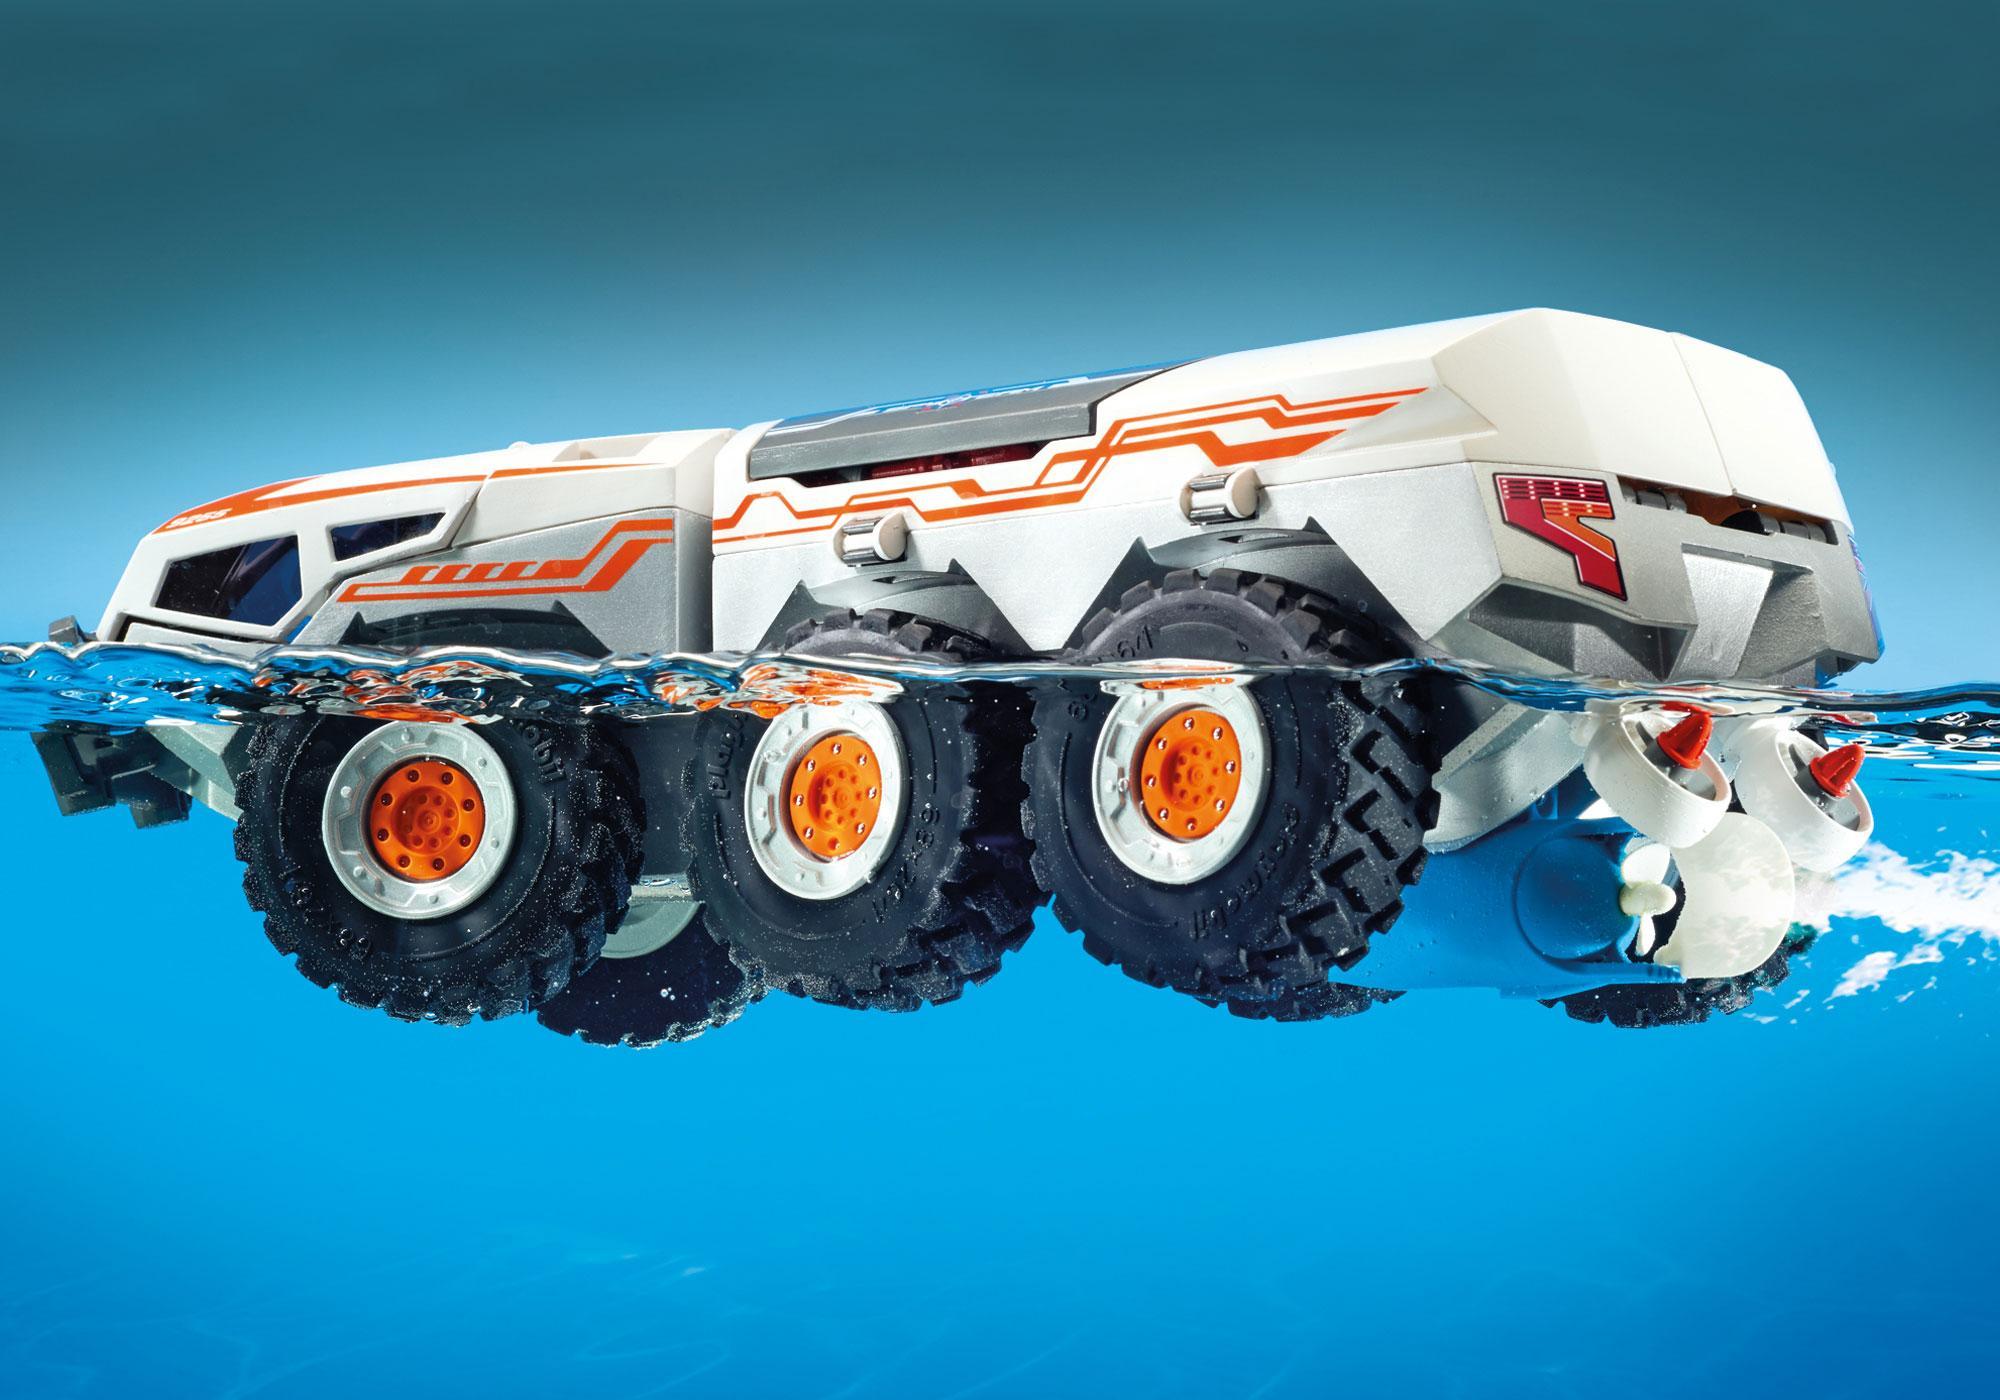 http://media.playmobil.com/i/playmobil/9255_product_extra2/Spy Team Battle Truck